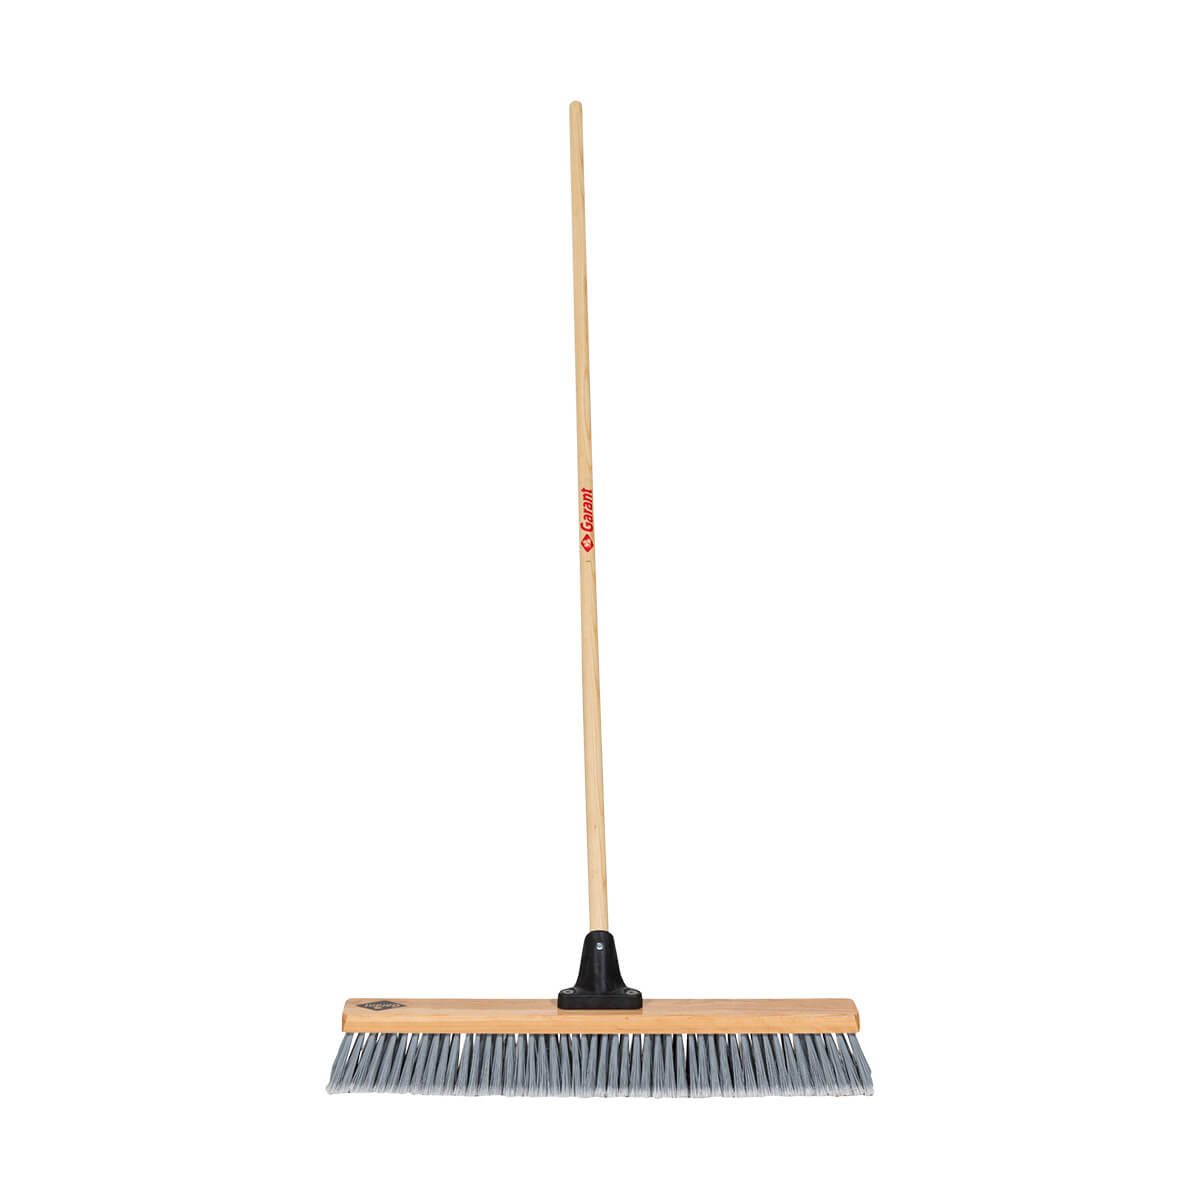 24'' Garant Broom Smooth Surface